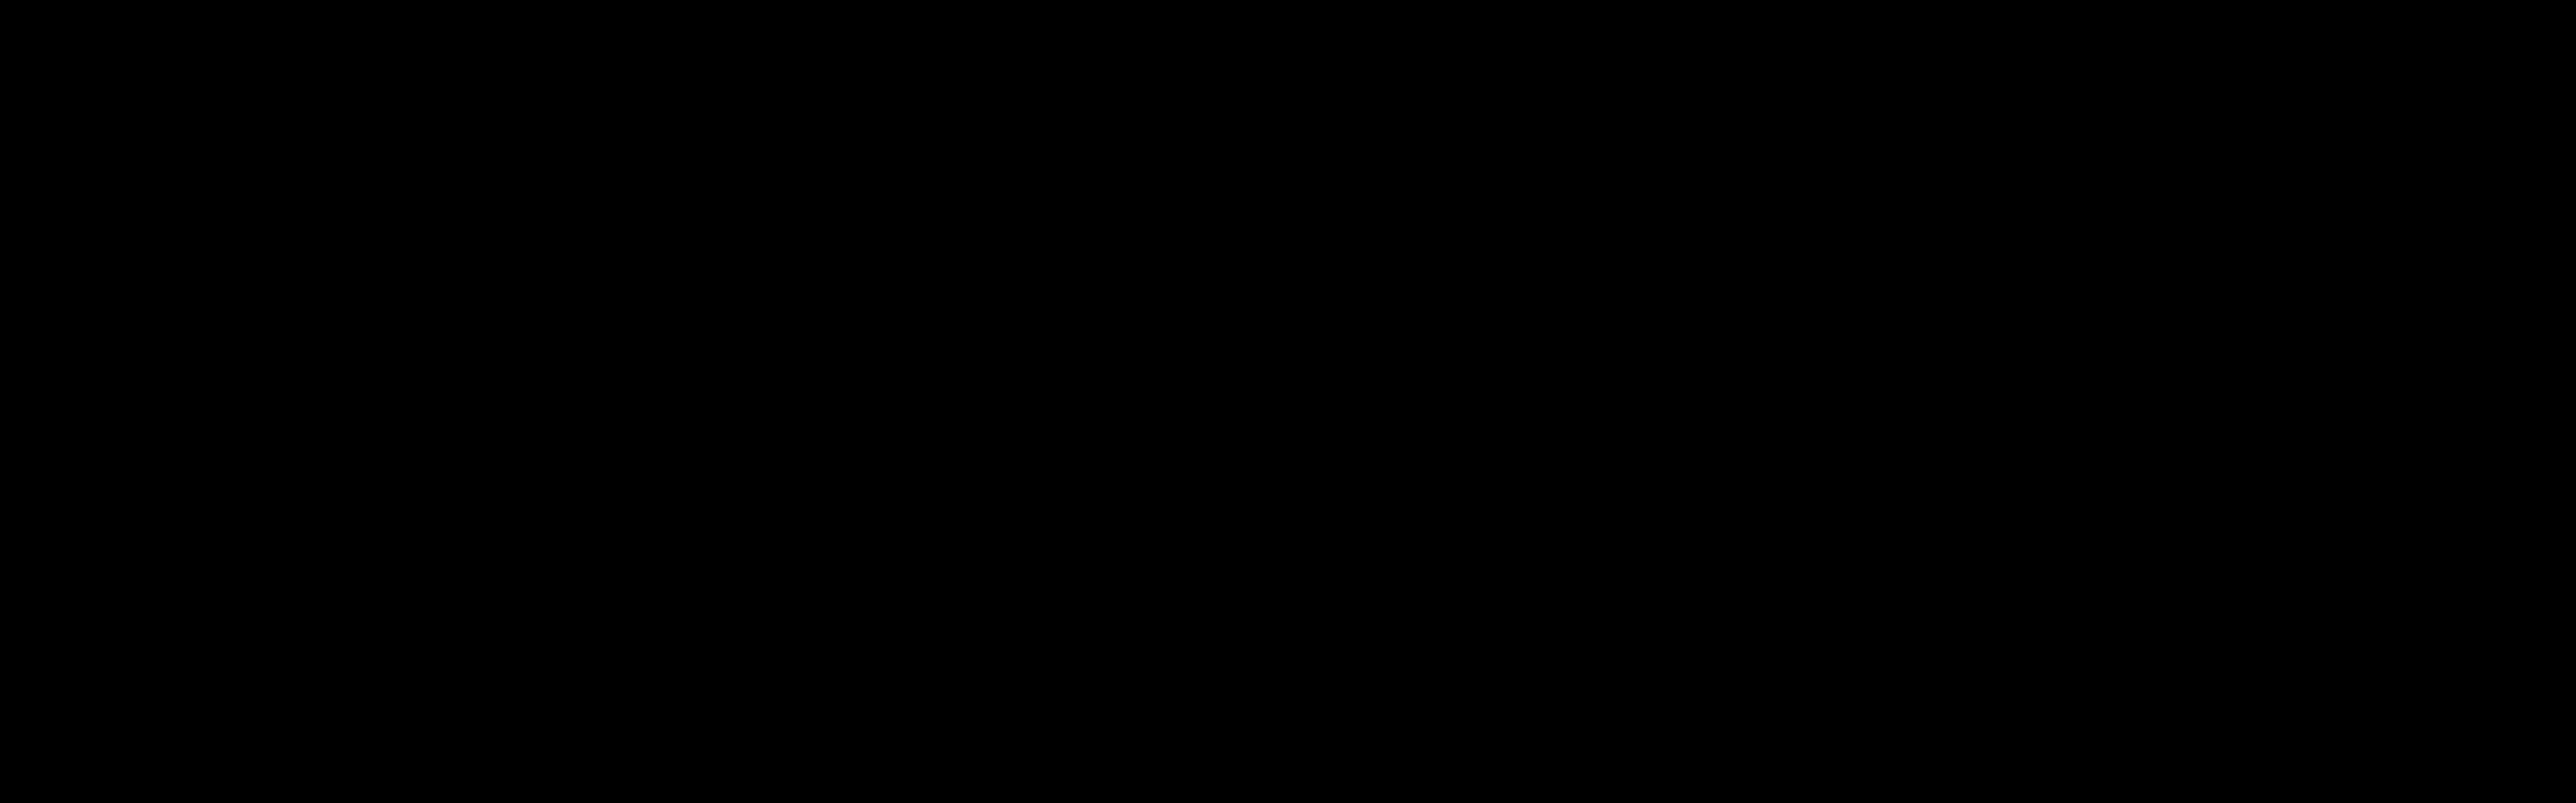 Aelpli